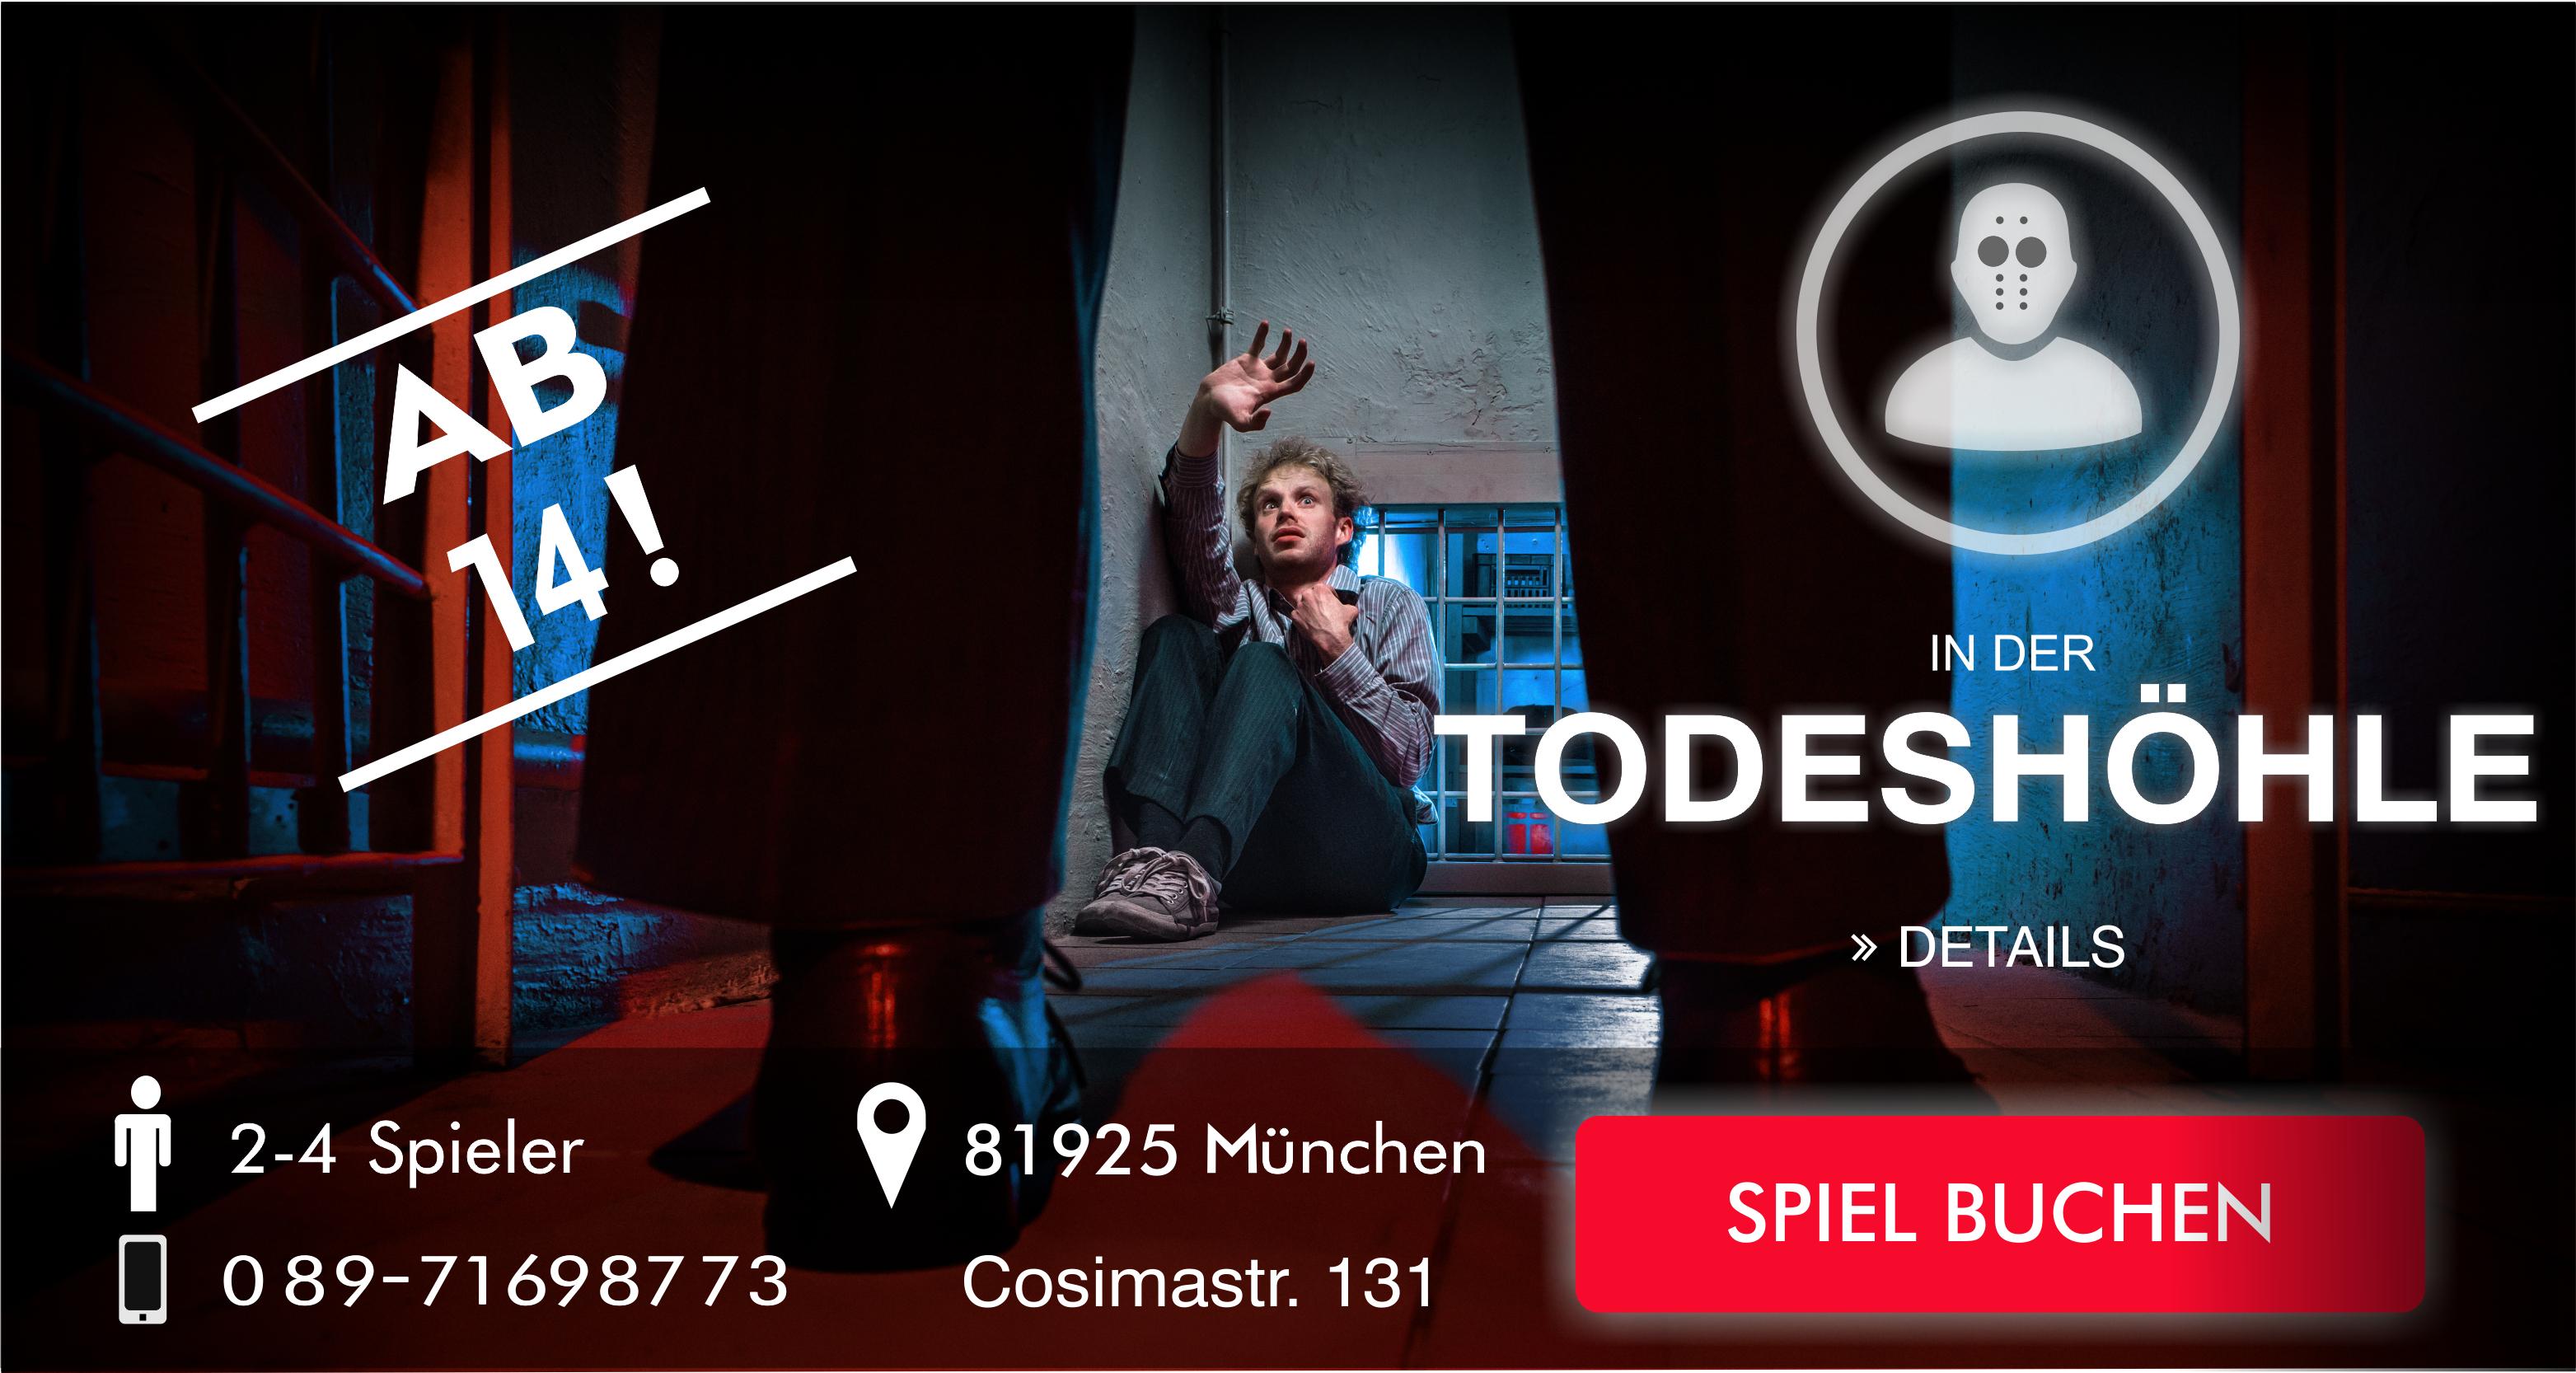 Escape Game München die Todeshöhle